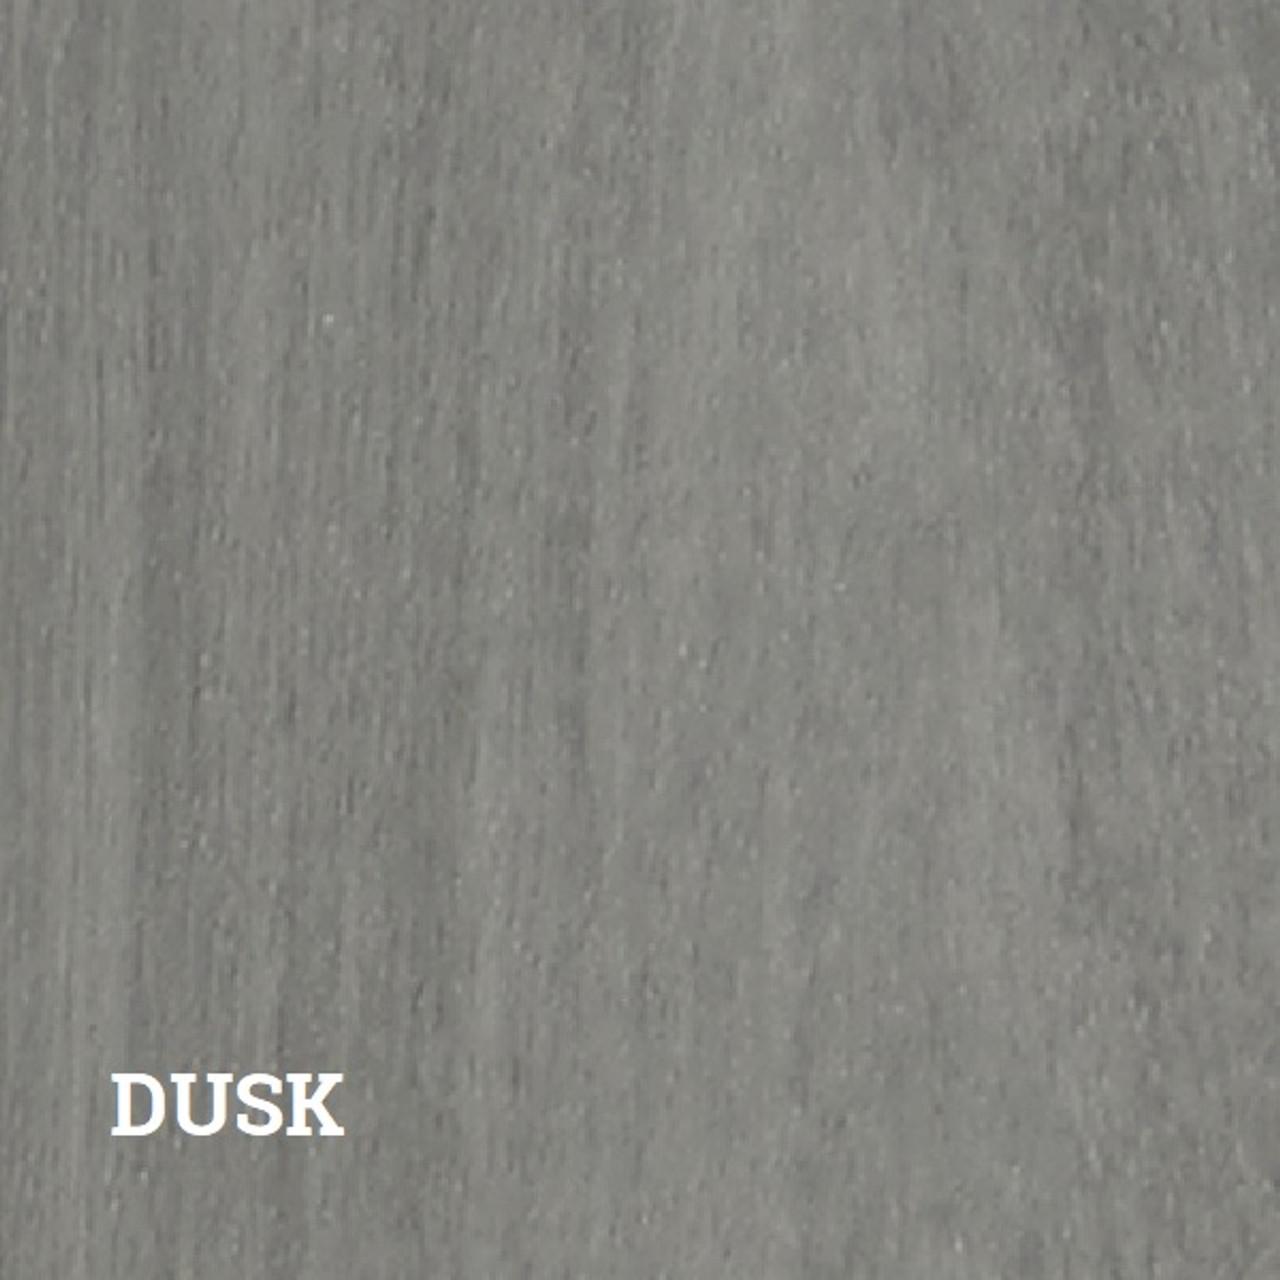 DecKorators Vault Decking in Dusk